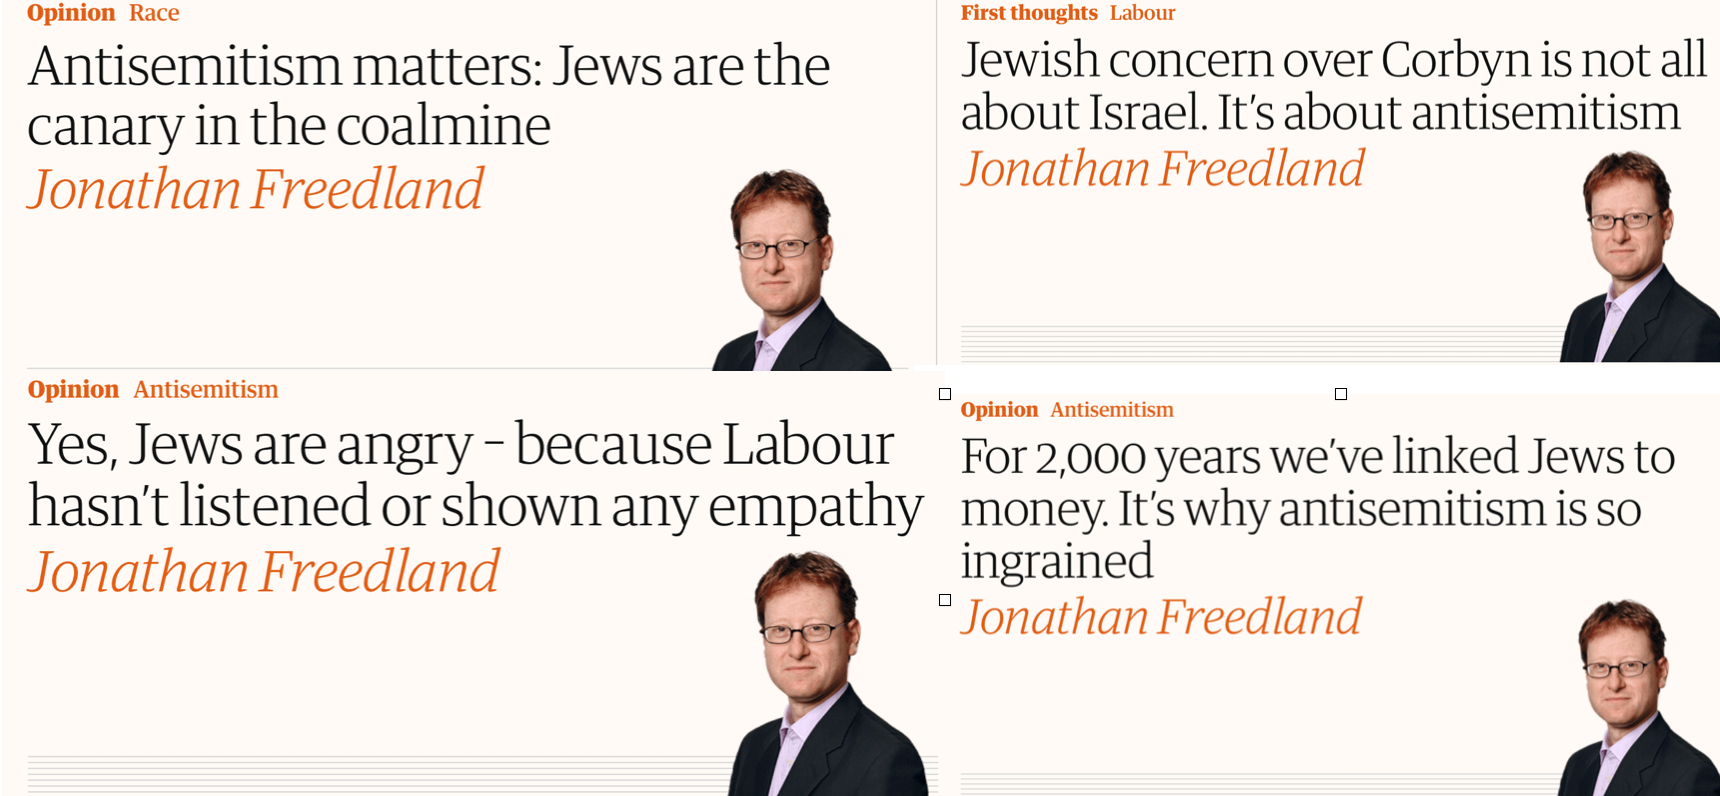 Jonathan Freedland: A Creature of Habit